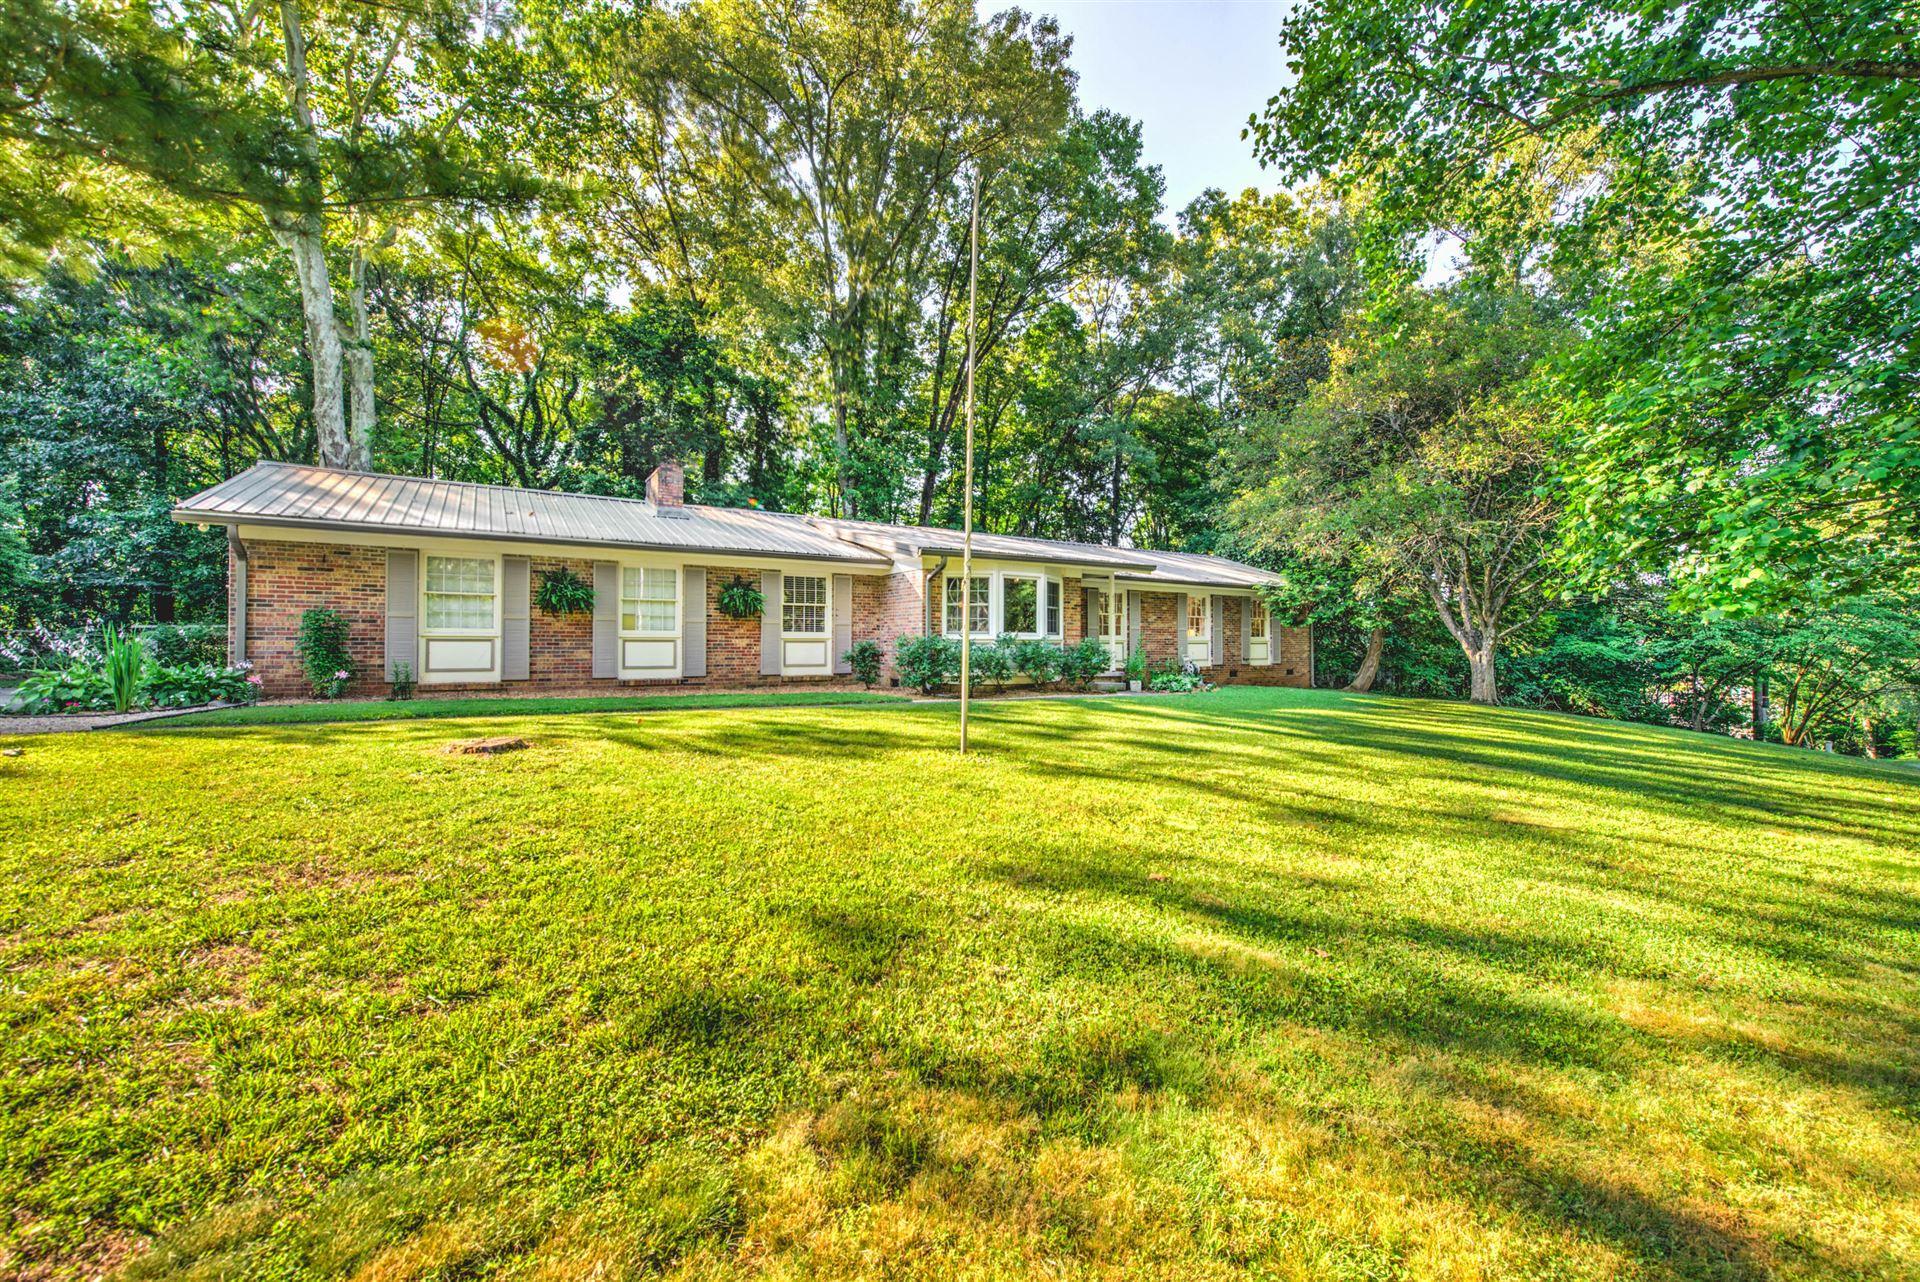 Photo of 8312 Landmark Drive, Knoxville, TN 37923 (MLS # 1156664)